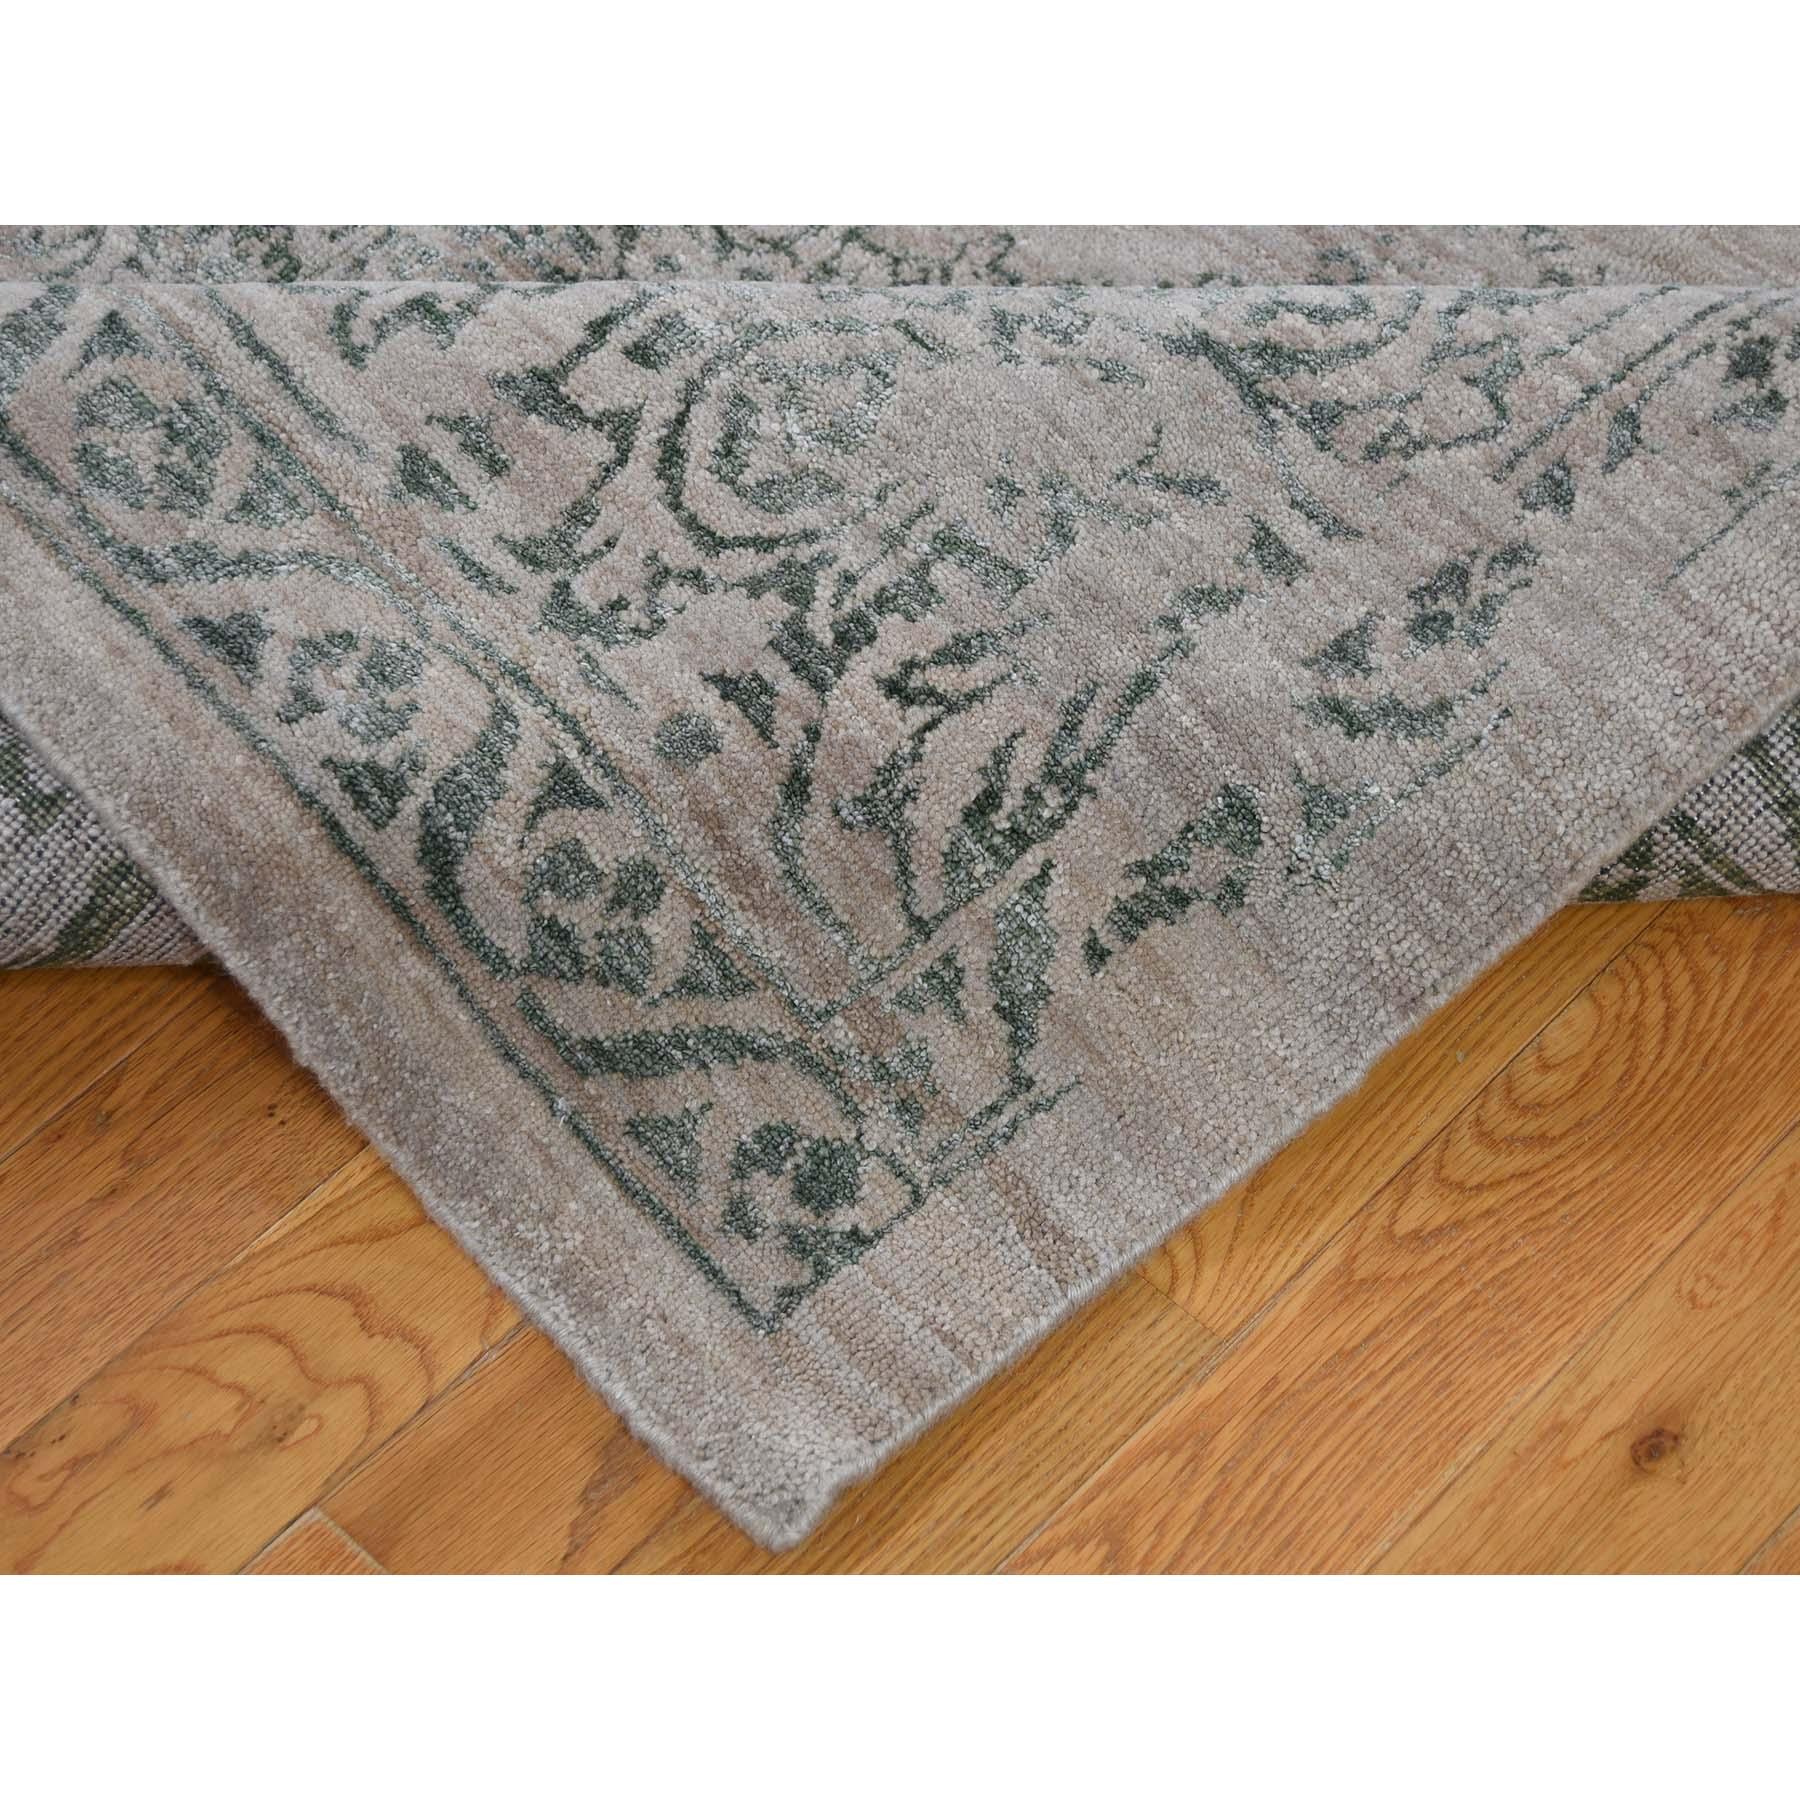 8-10 x12- Hand-Knotted Wool and Silk Broken Heriz Design Oriental Rug